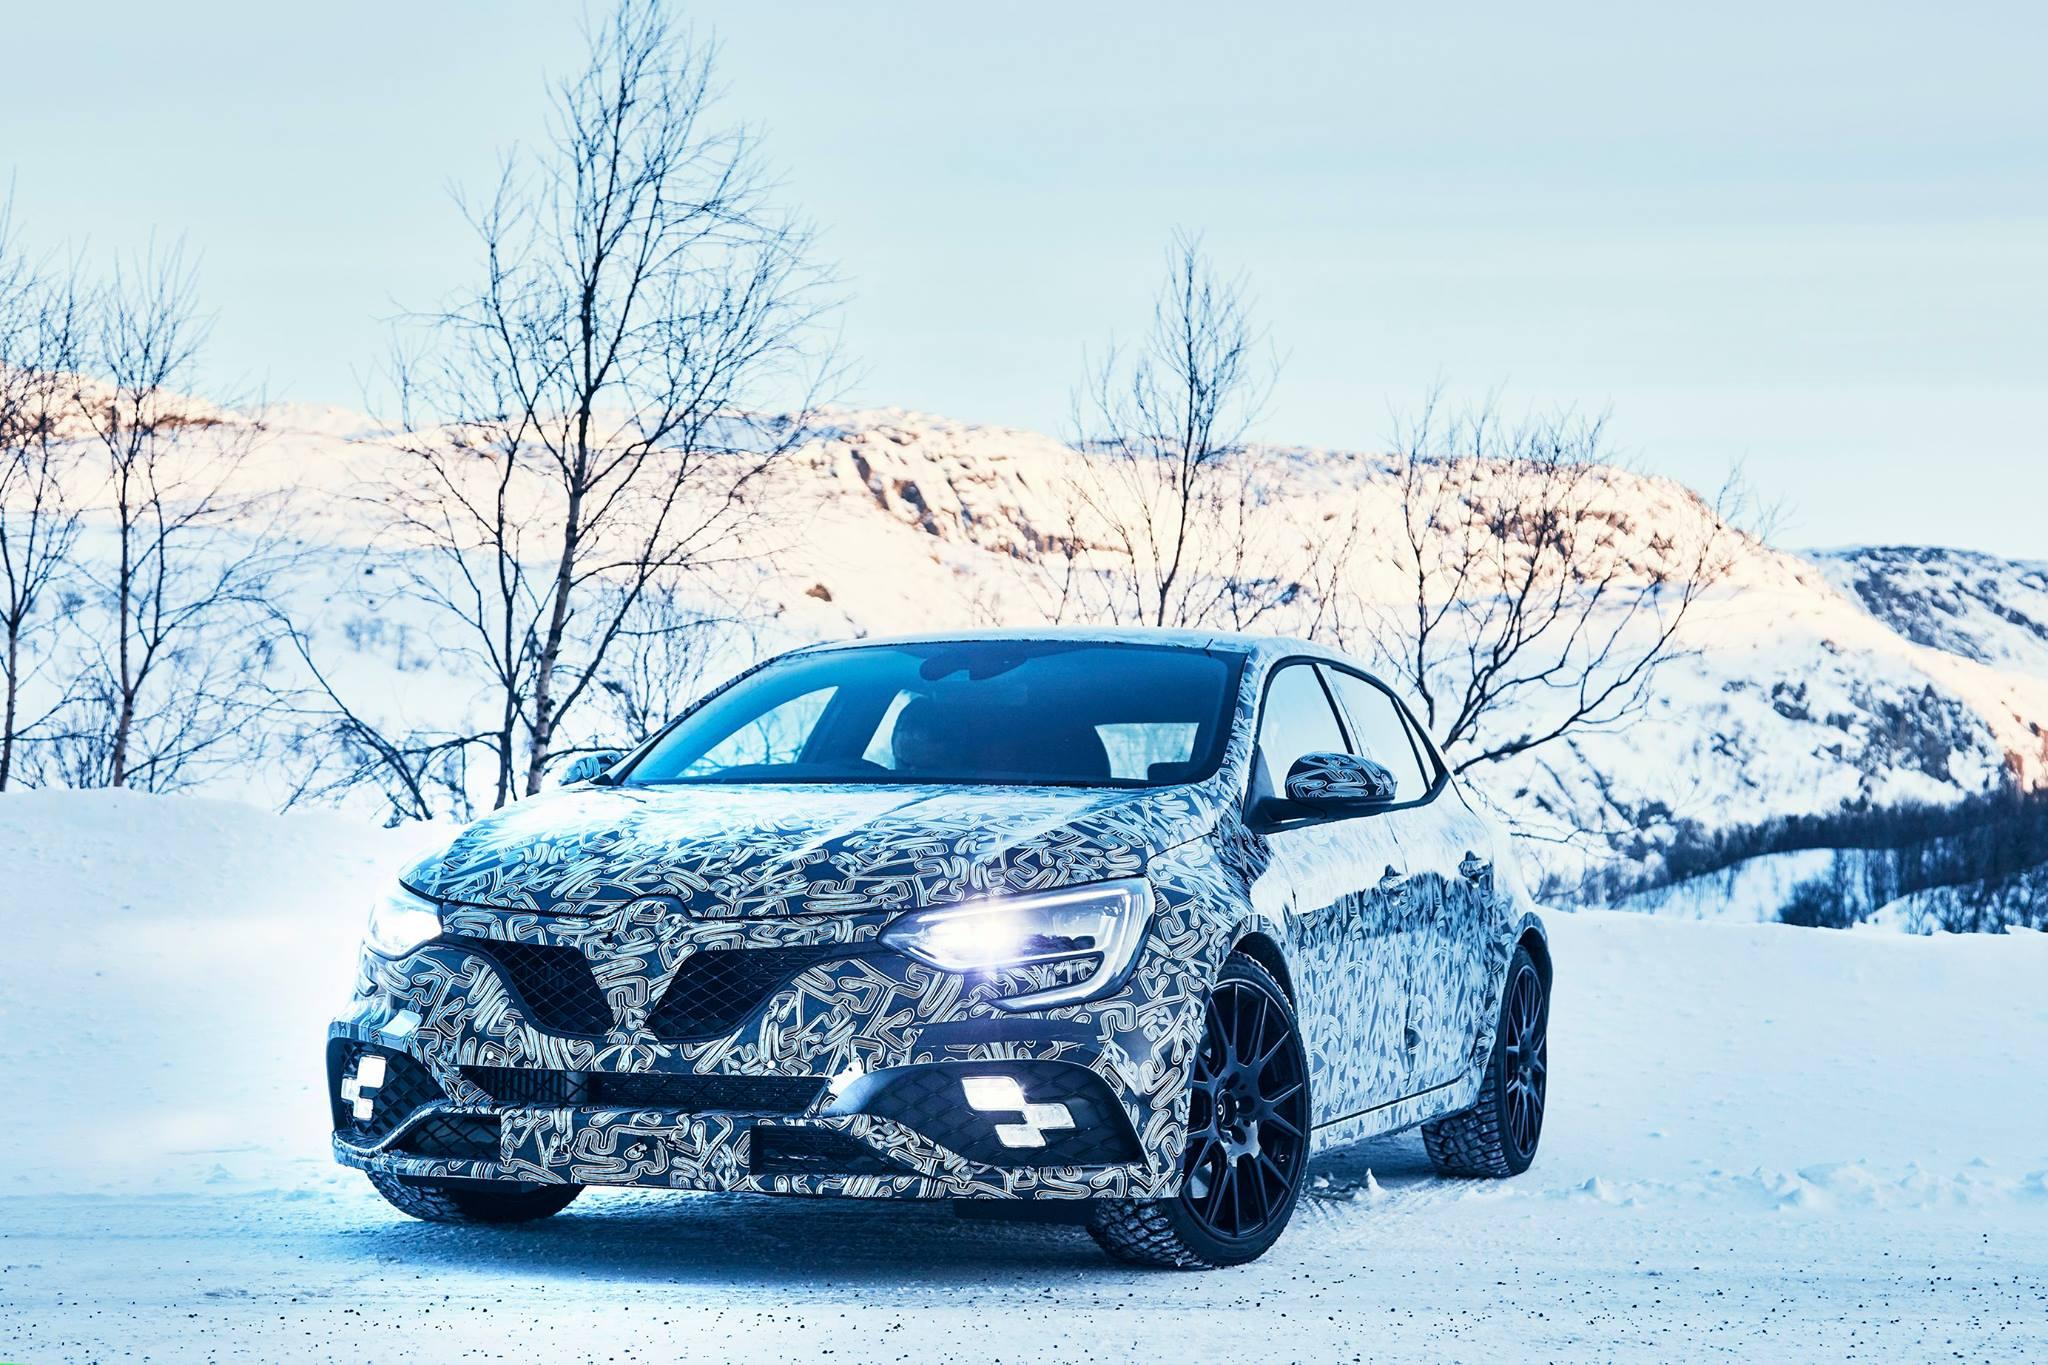 Renault Megane RS teasers snow (2)